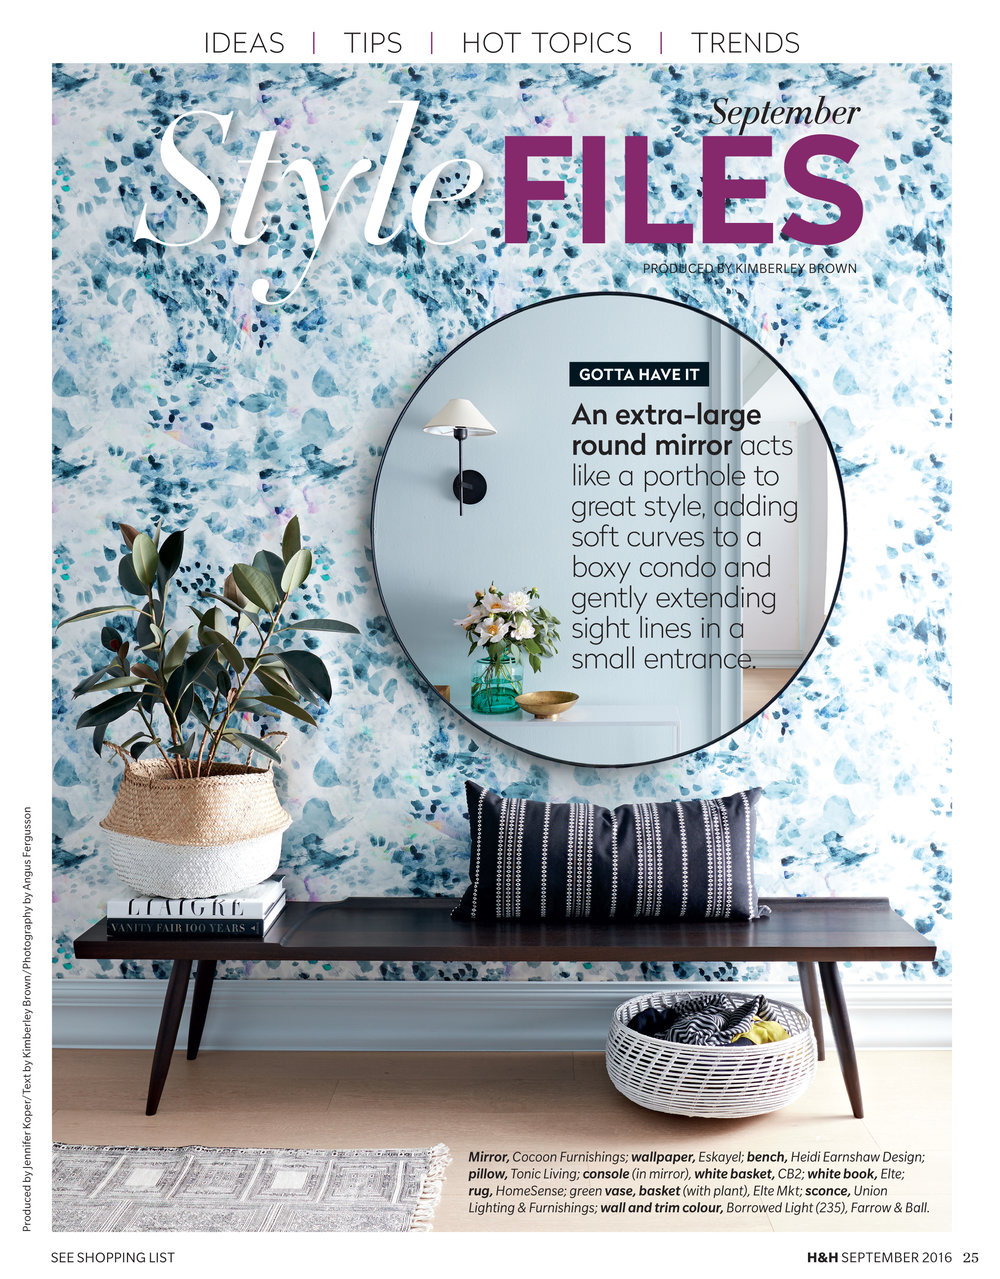 In the Press - Work by Briana DeVoe has been featured in House & Home Magazine, WSJ Magazine, Design Milk, Design Sponge, and Elle.HR